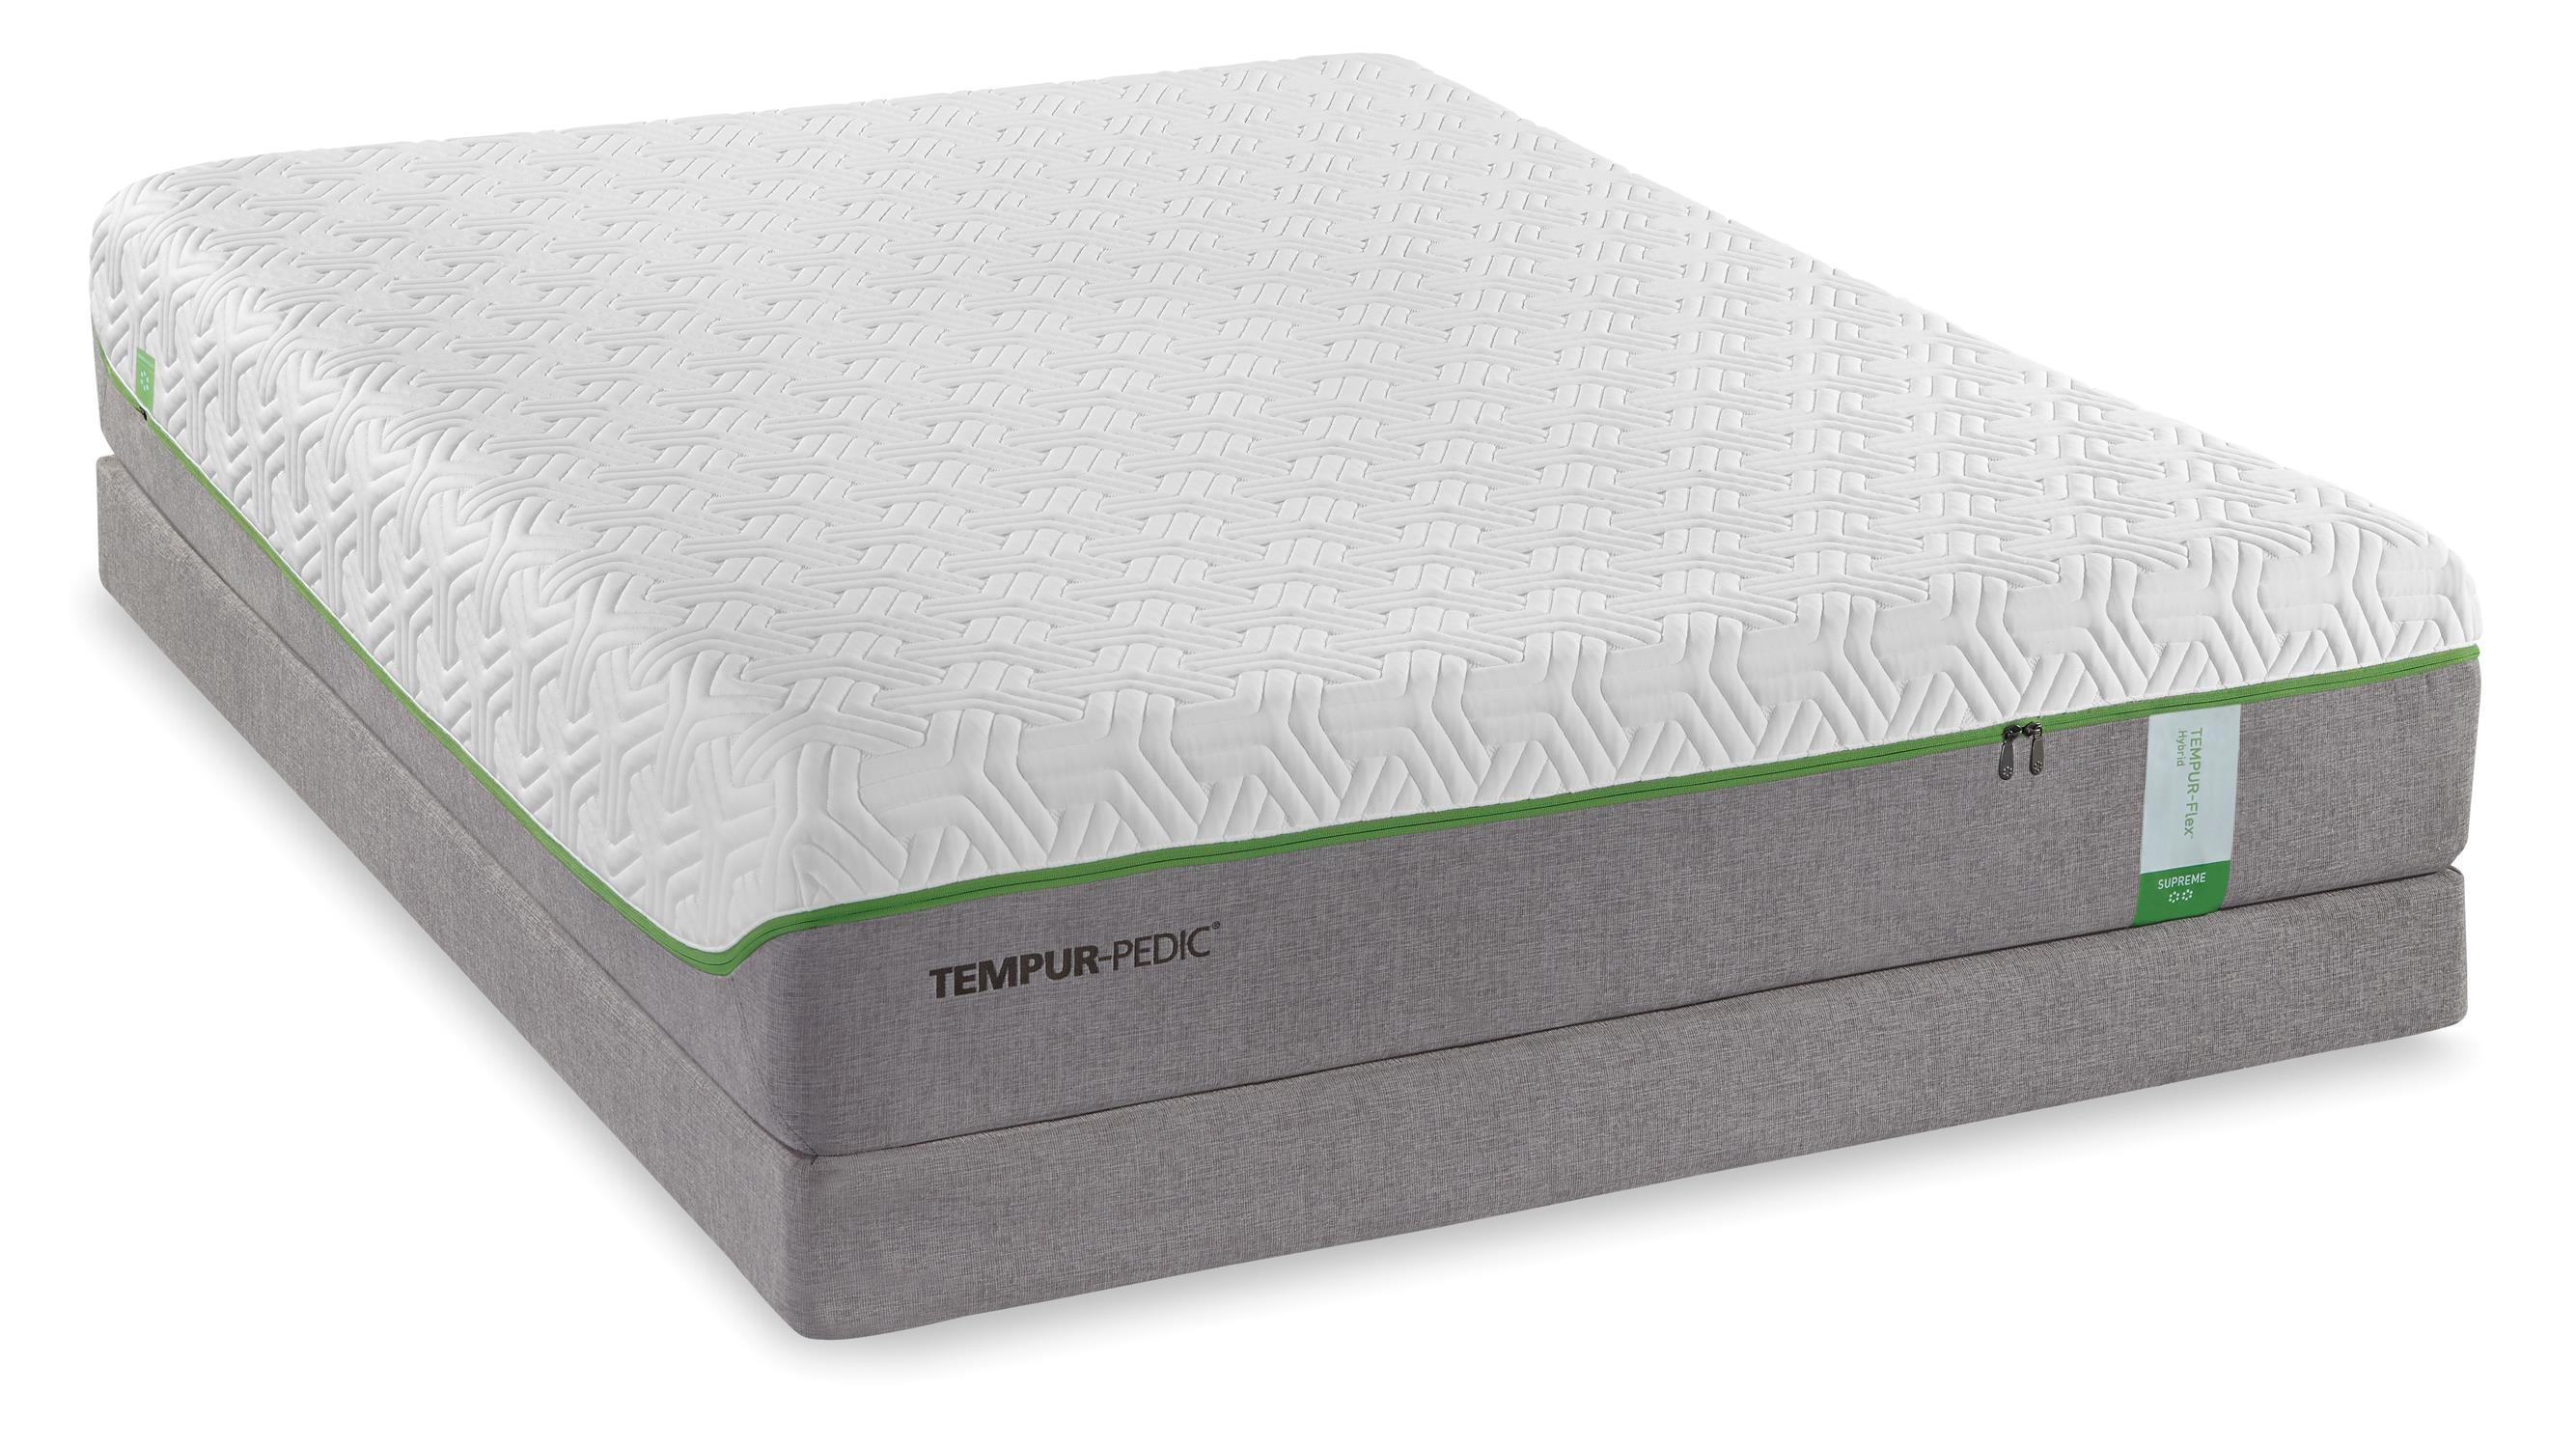 Tempur-Pedic® TEMPUR-Flex Supreme Cal King Medium Plush Mattress Set - Item Number: 10116180+2x21510190